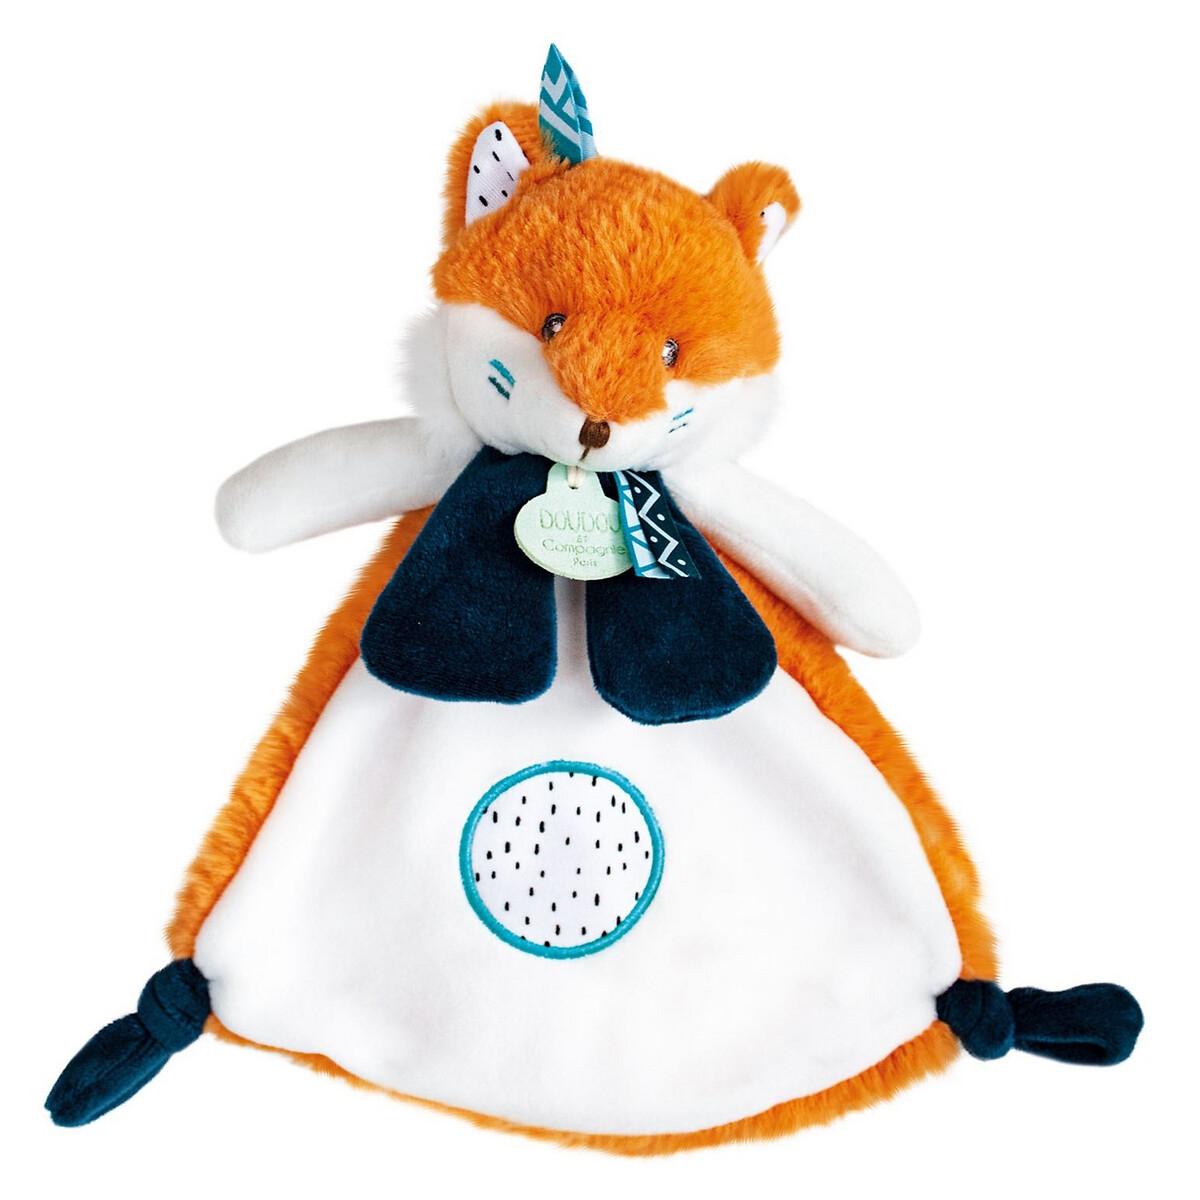 An image of Doudou Et Compagnie Newborn Tiwipi Fox Comforter - 23cm